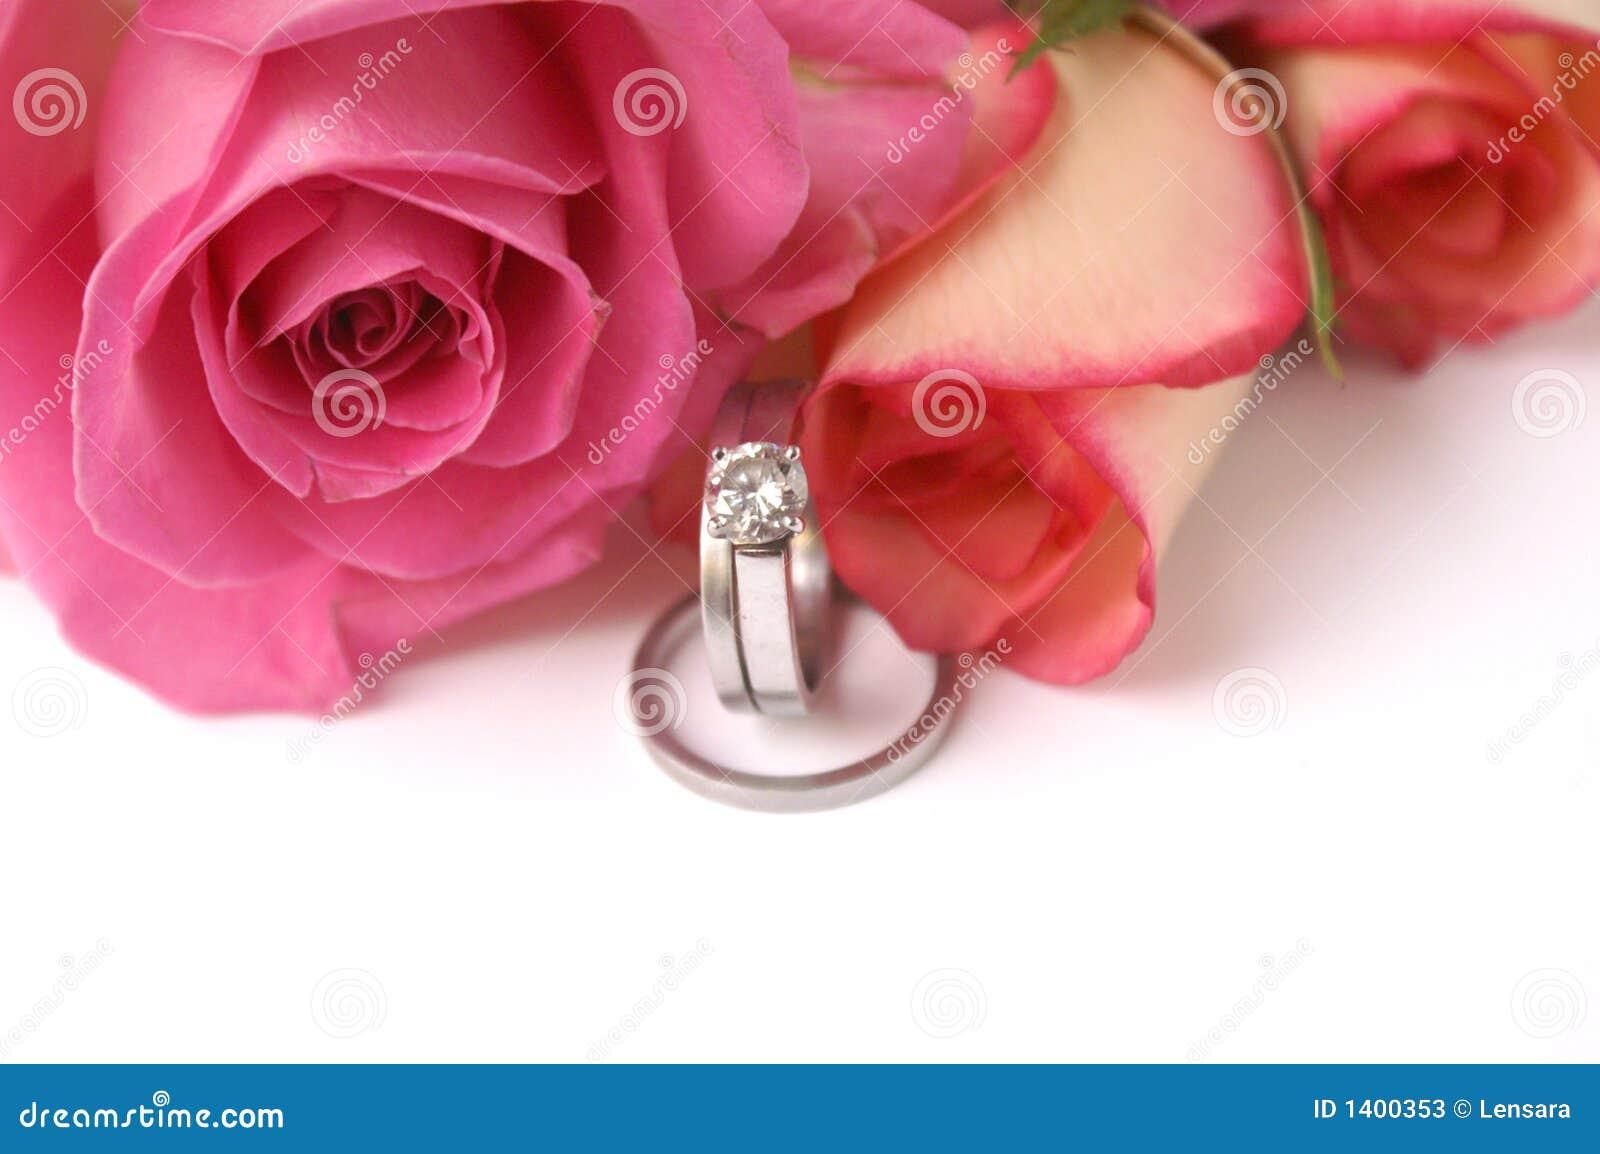 Faixas e rosas de casamento